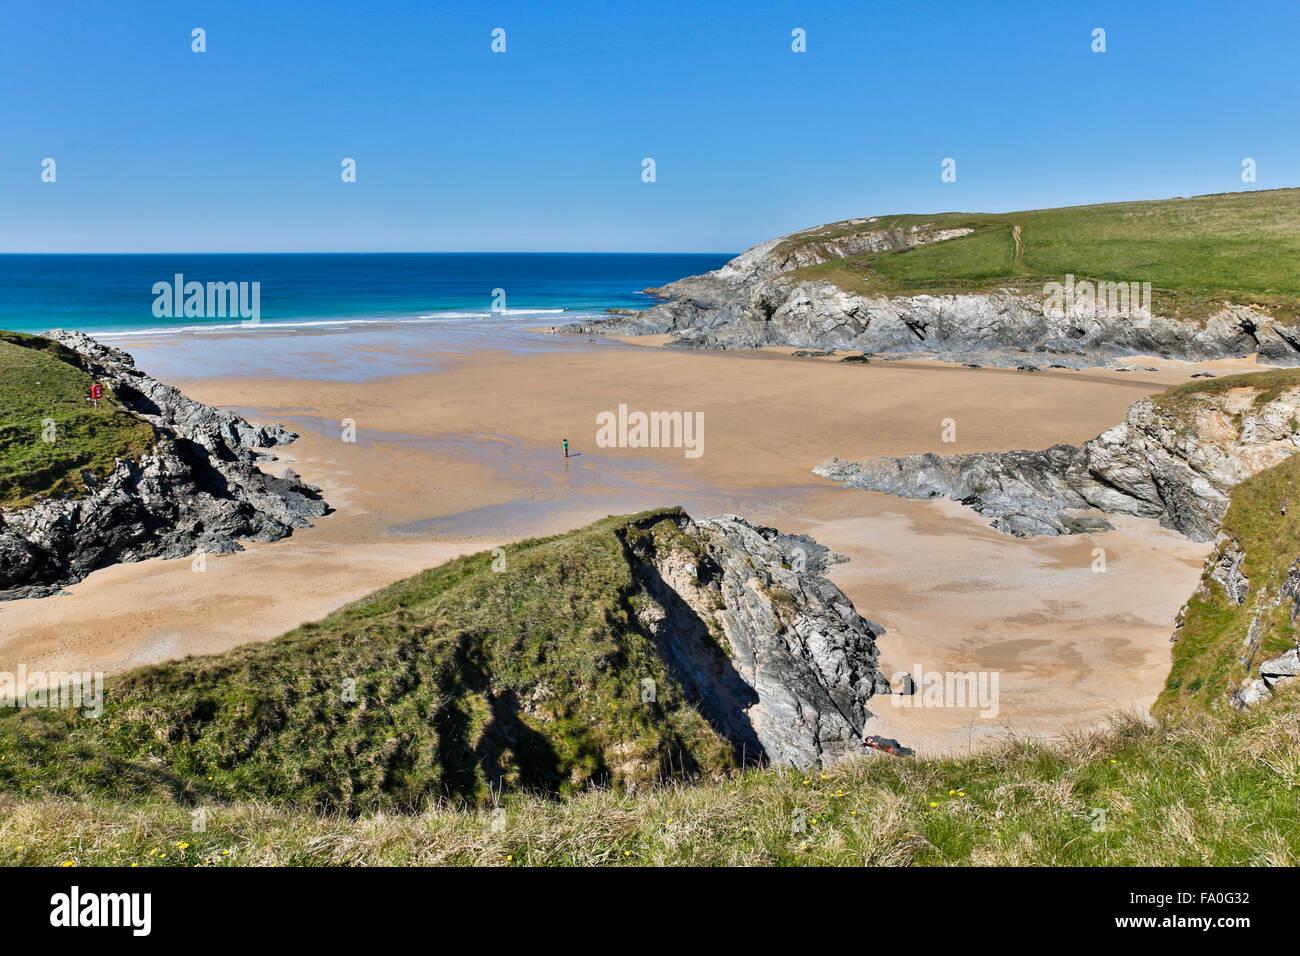 Polly Joke; Beach; Cornwall; UK - Stock Image